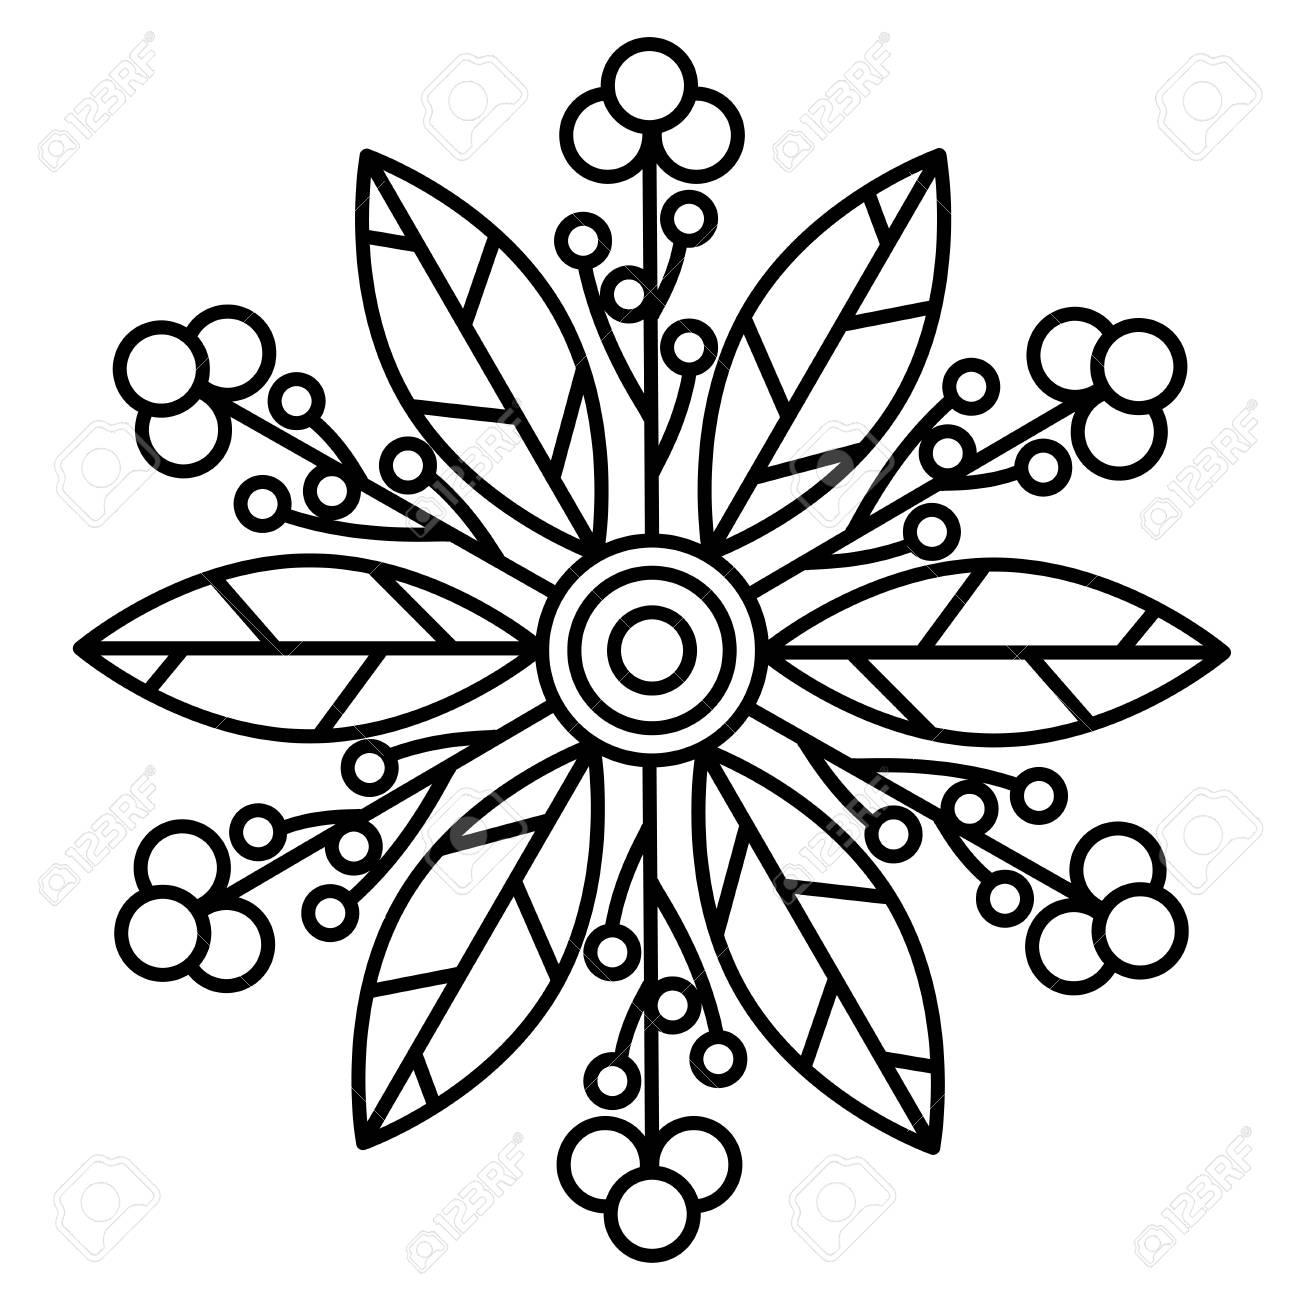 Beginner Abstract Mandala Art